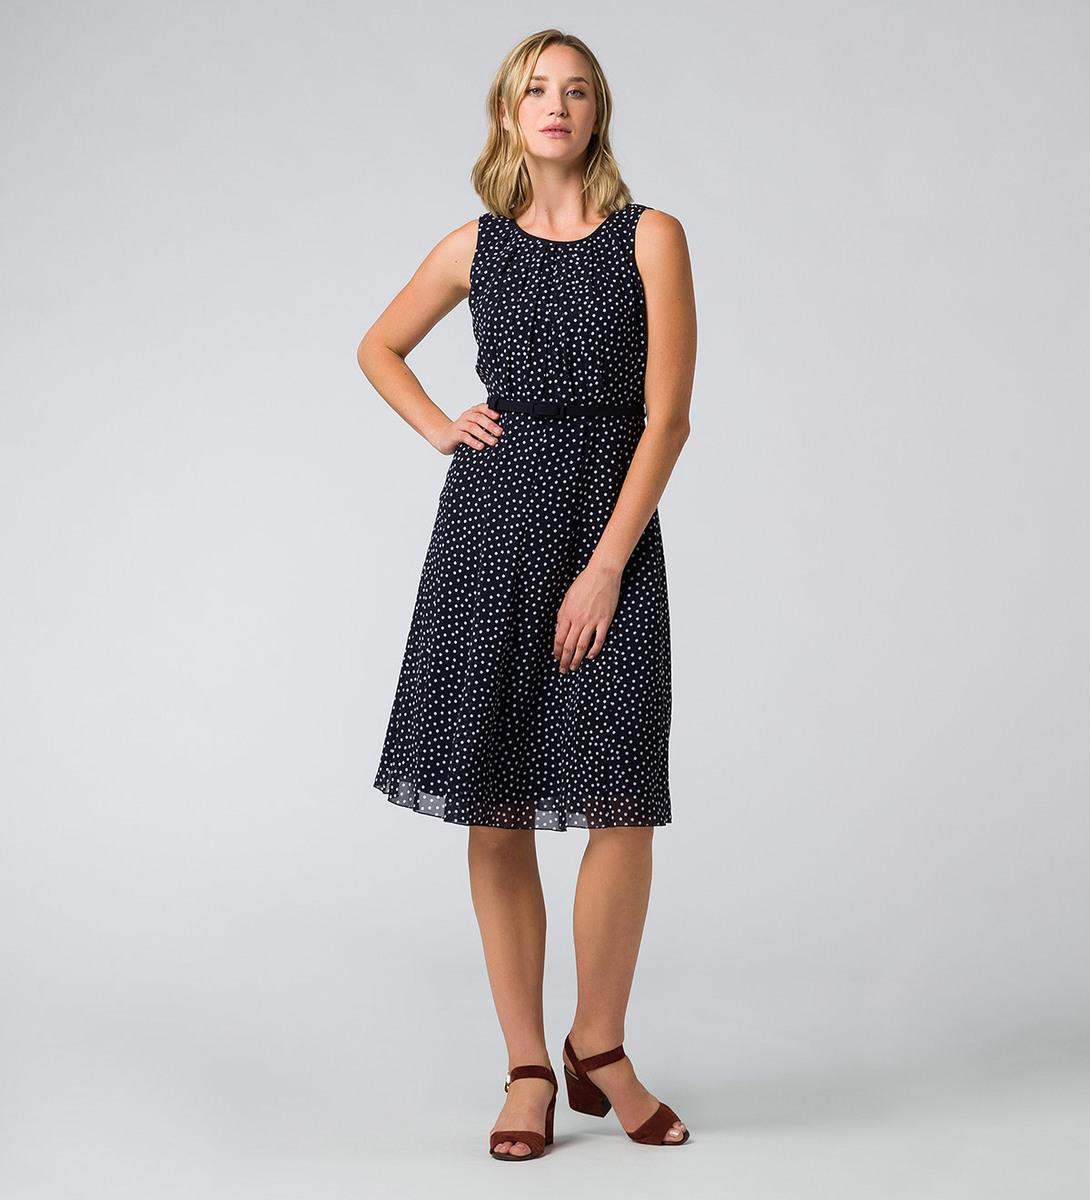 Kleid mit Polka Dots blue black